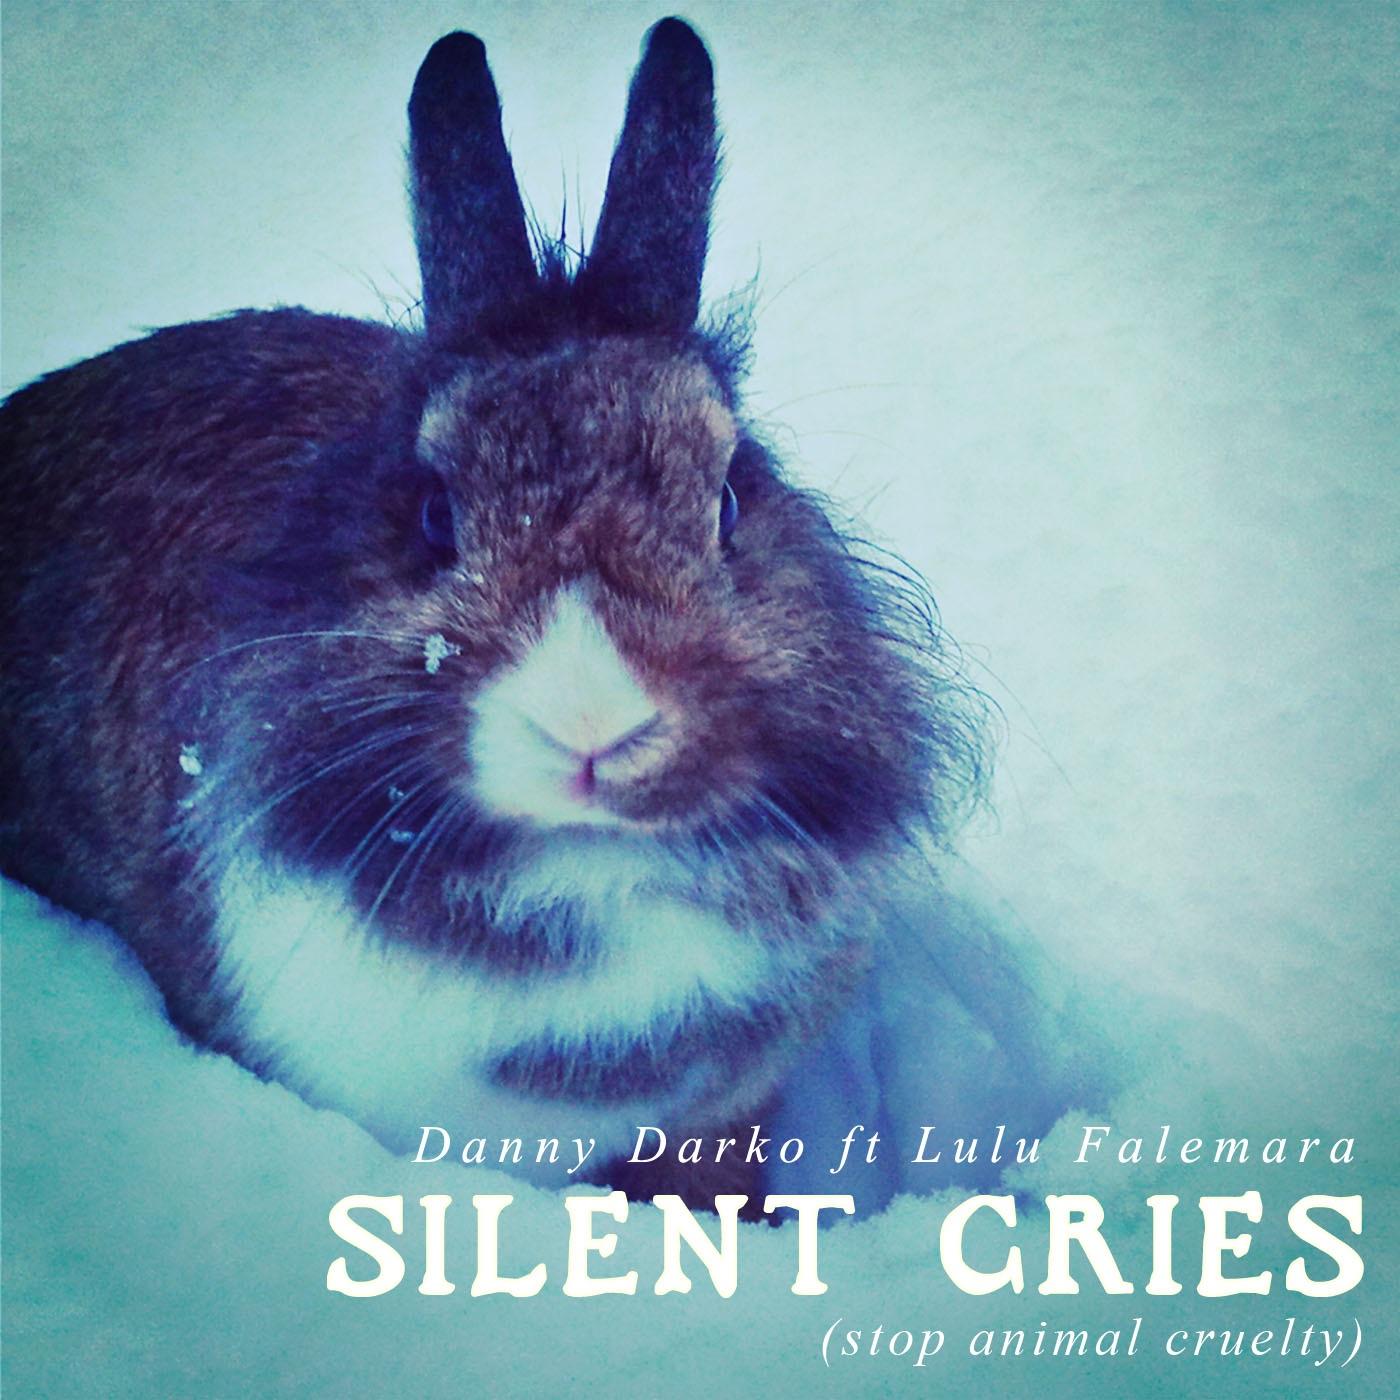 Silent Cries (Stop Animal Cruelty) [feat. Lulu Falemara] - Single